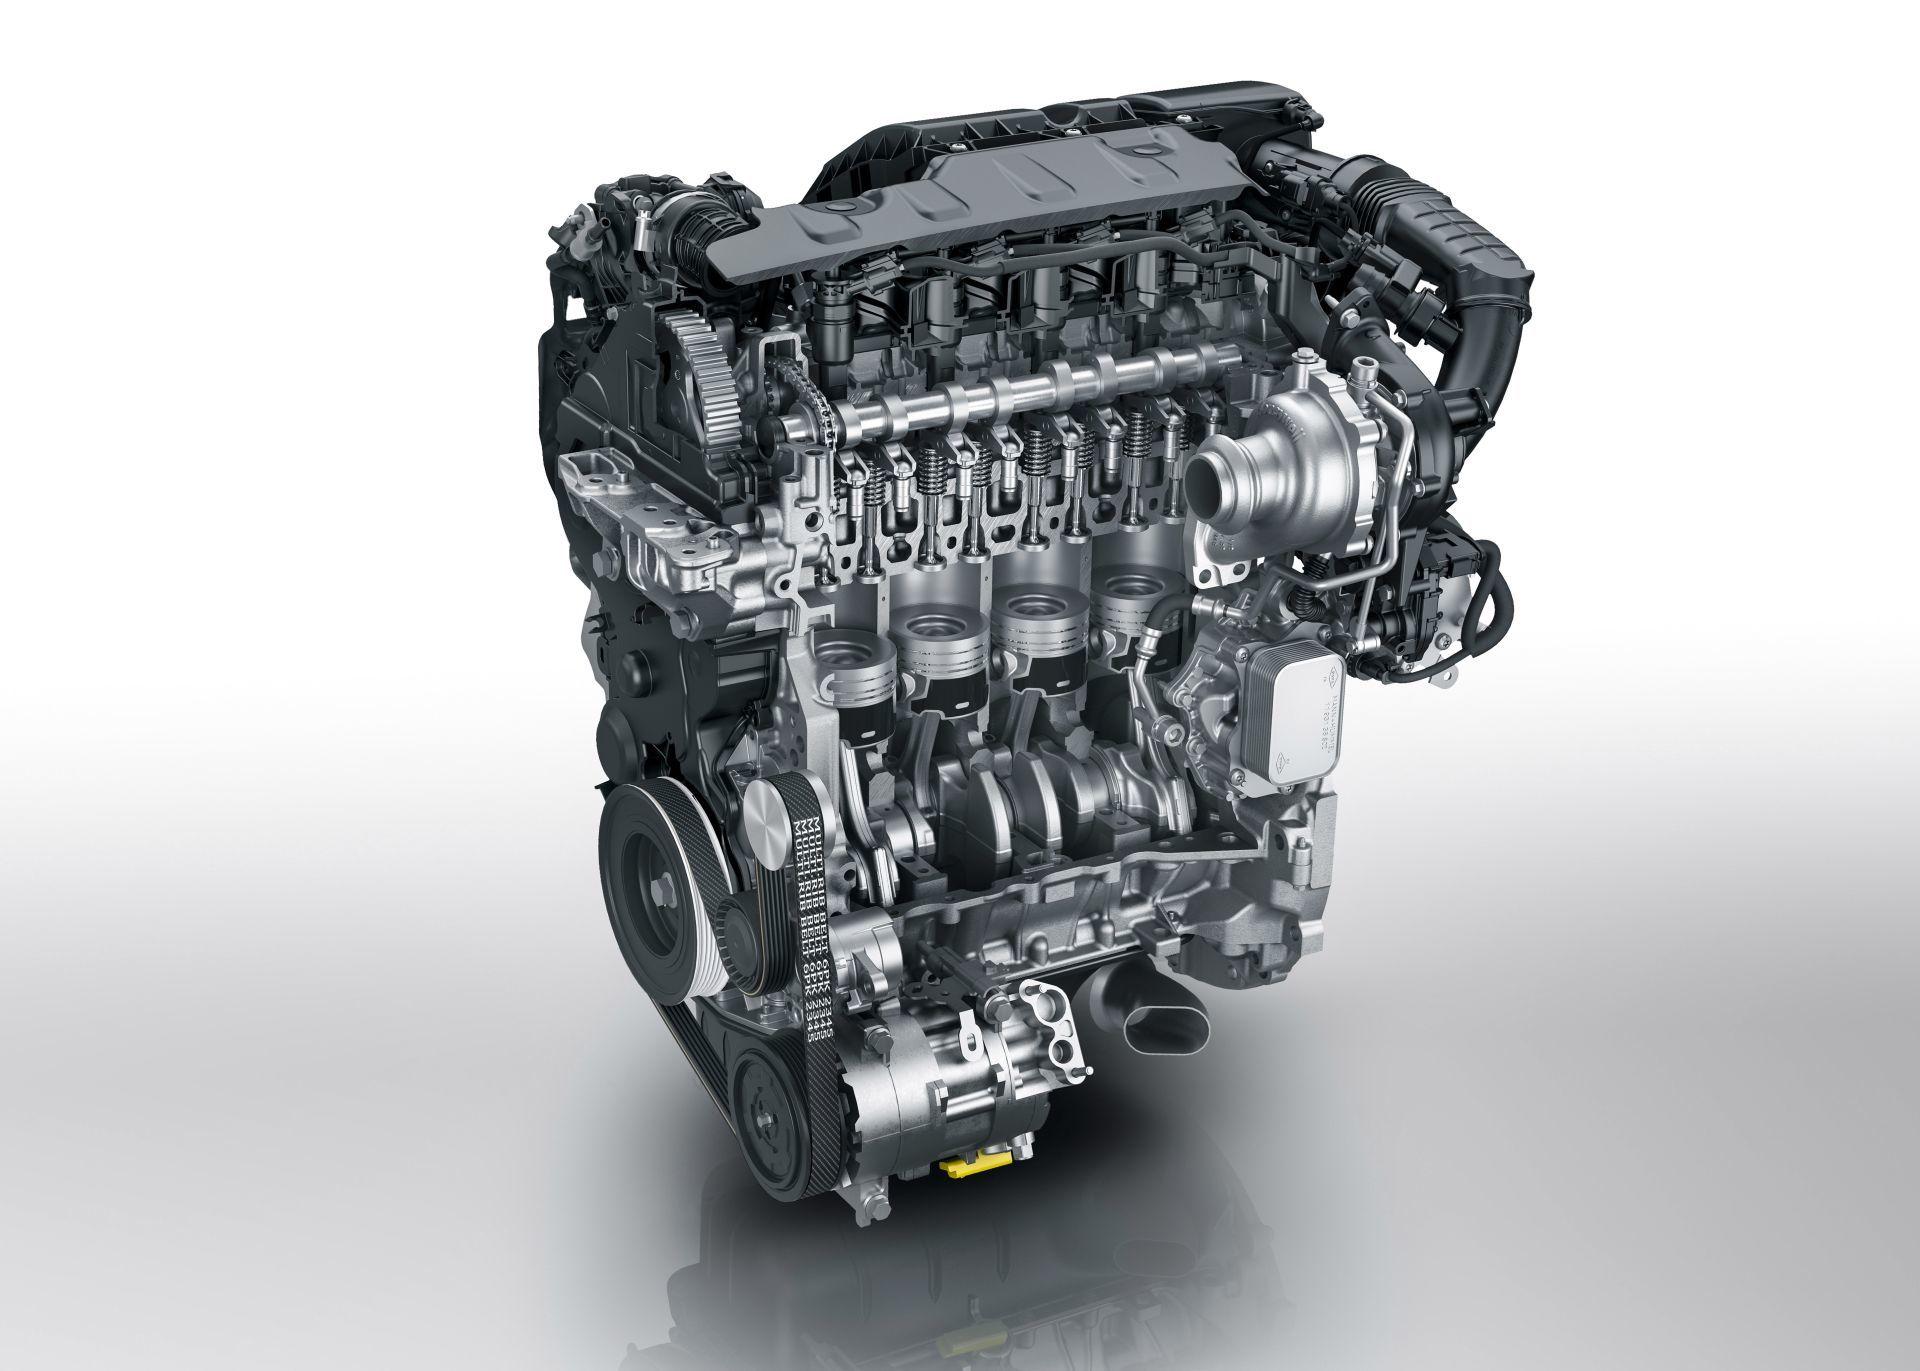 New 1.5 Litre Diesel For Opel Grandland X